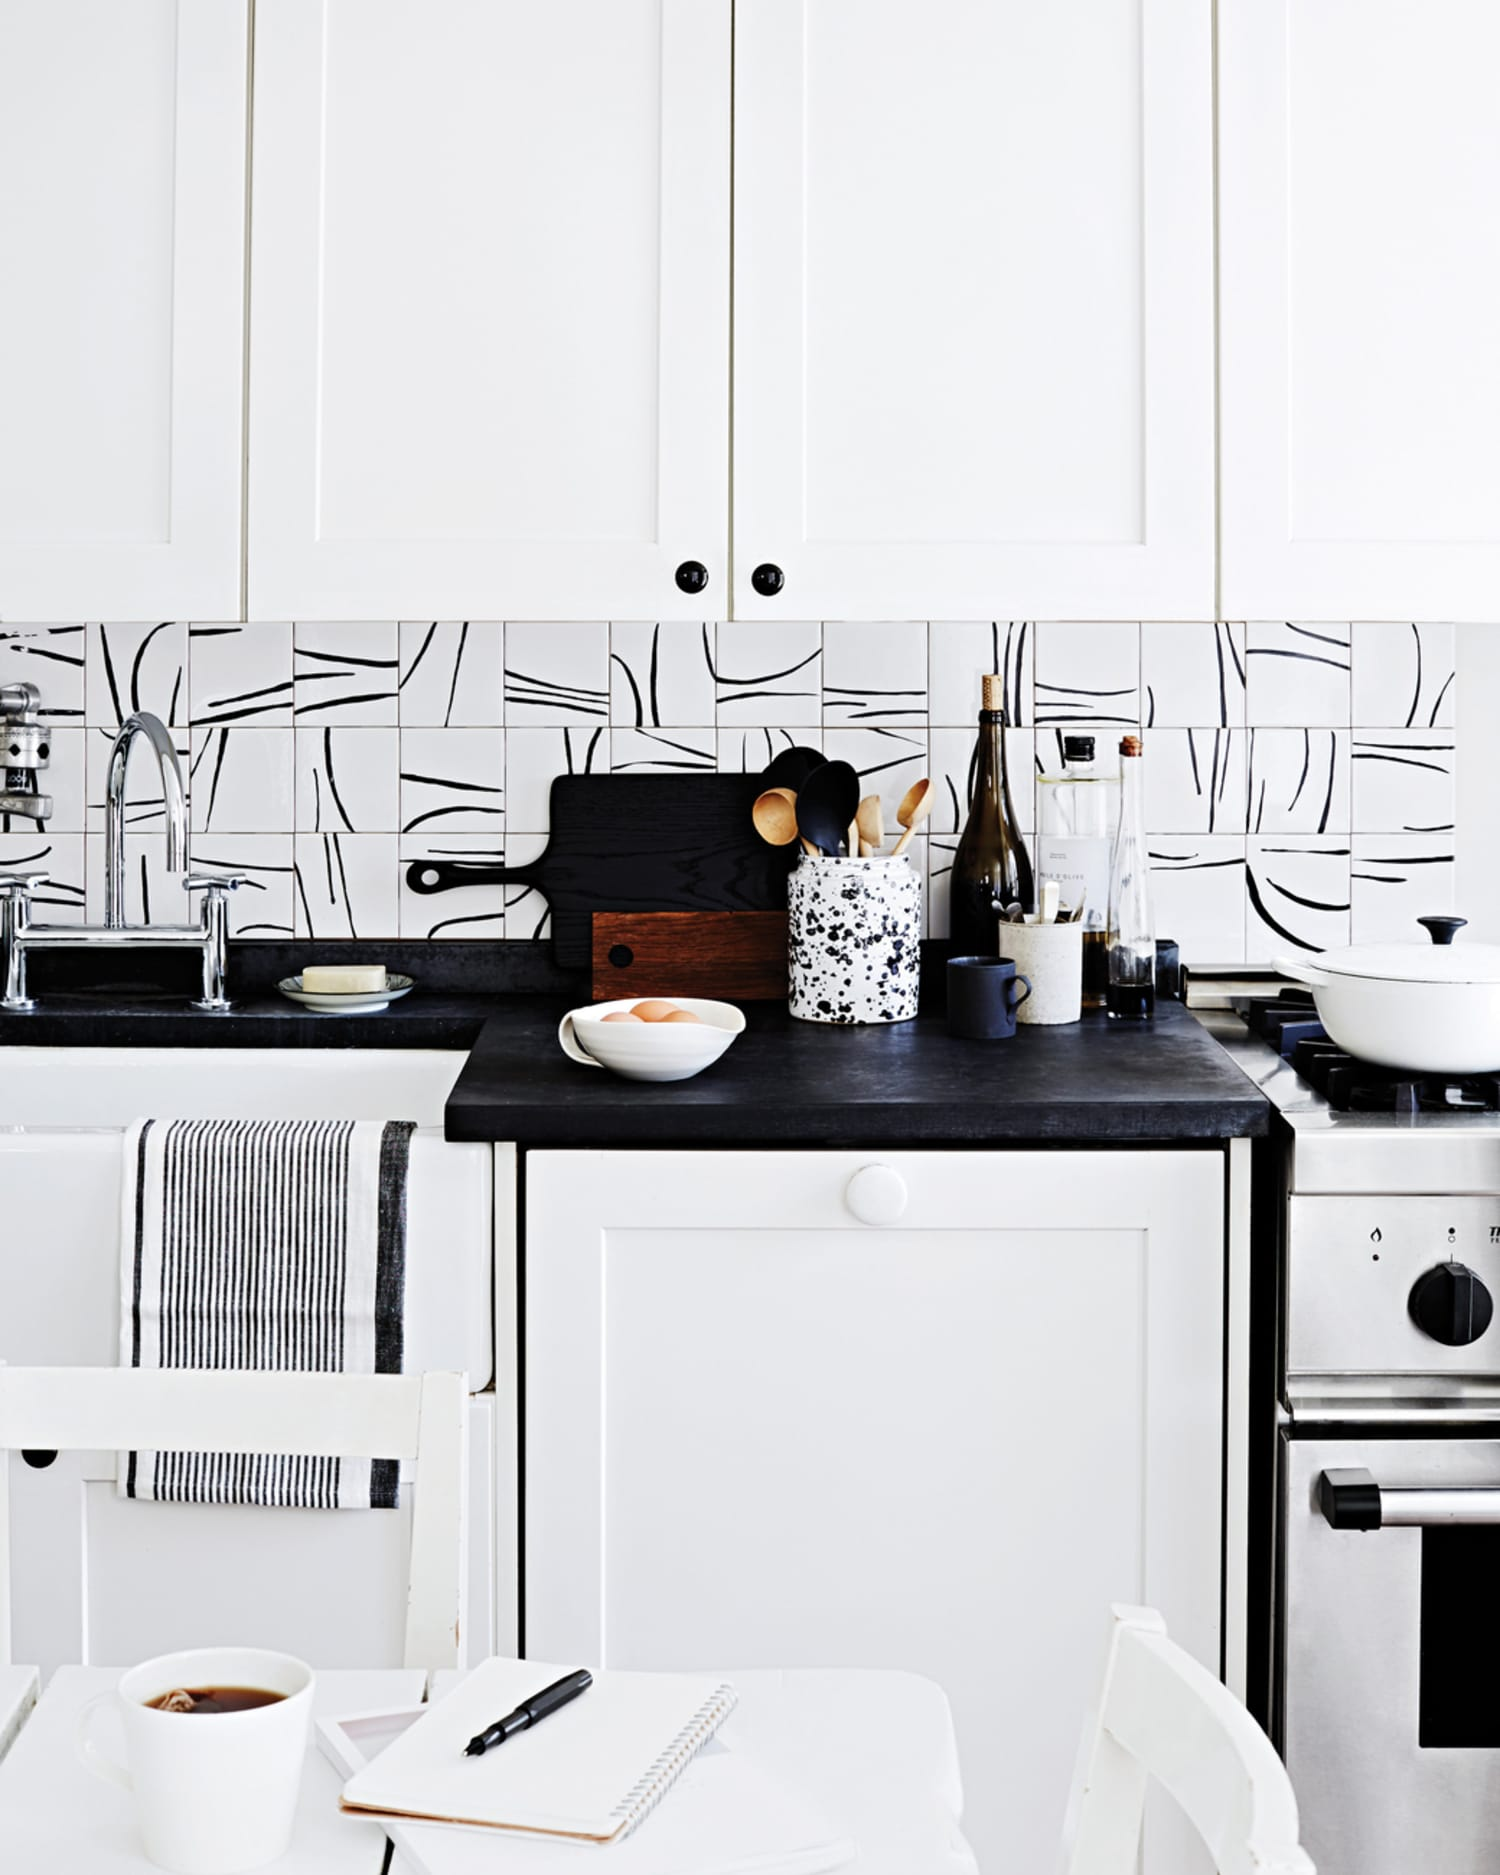 - Tile Transformations: Easy Ways To Update Your Kitchen Backsplash